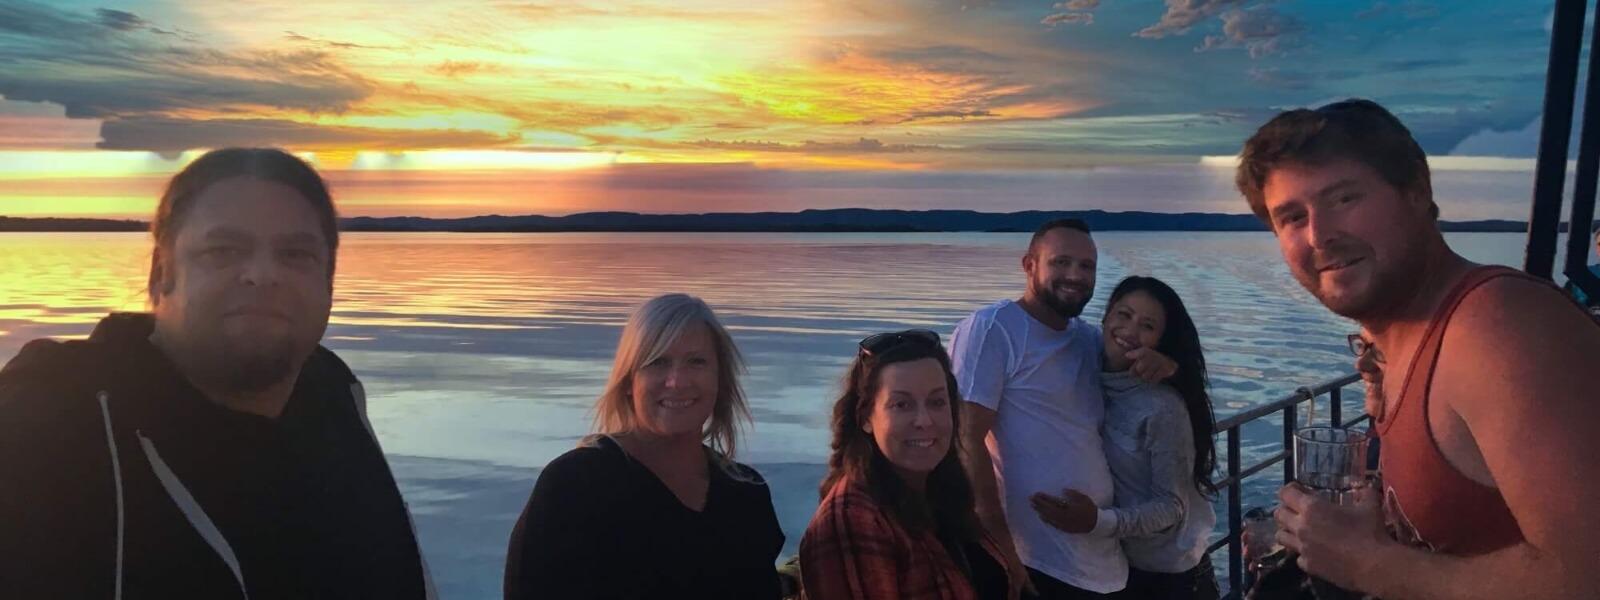 Passengers of a sunset dinner cruise enjoying a beautiful evening on the water.